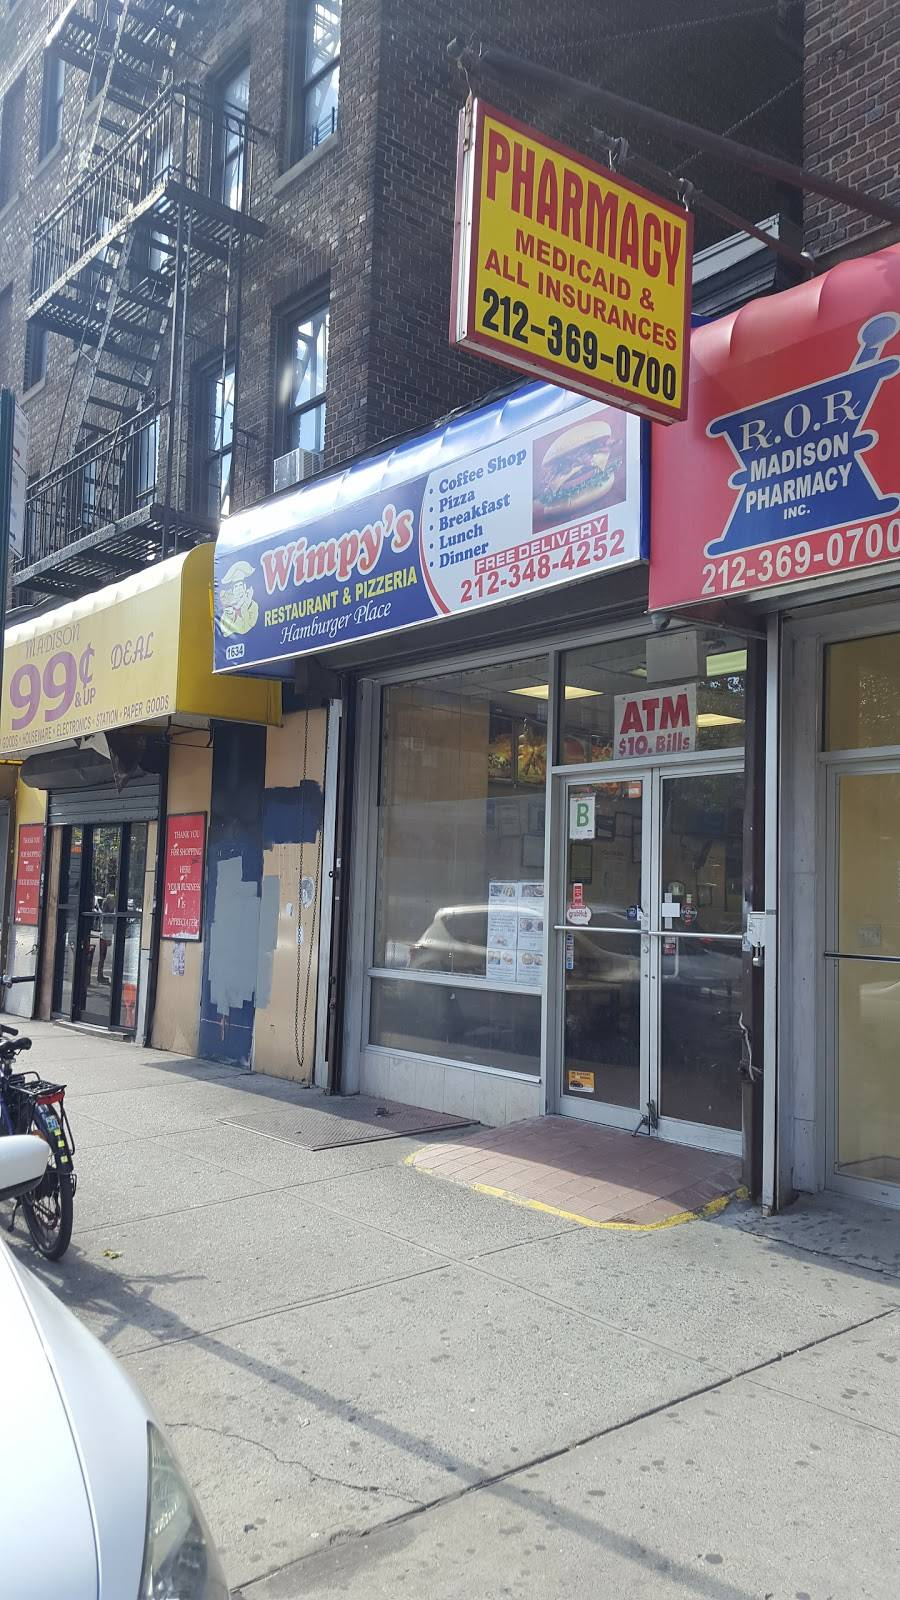 Wimpys   restaurant   1634 Madison Ave, New York, NY 10029, USA   2123484252 OR +1 212-348-4252